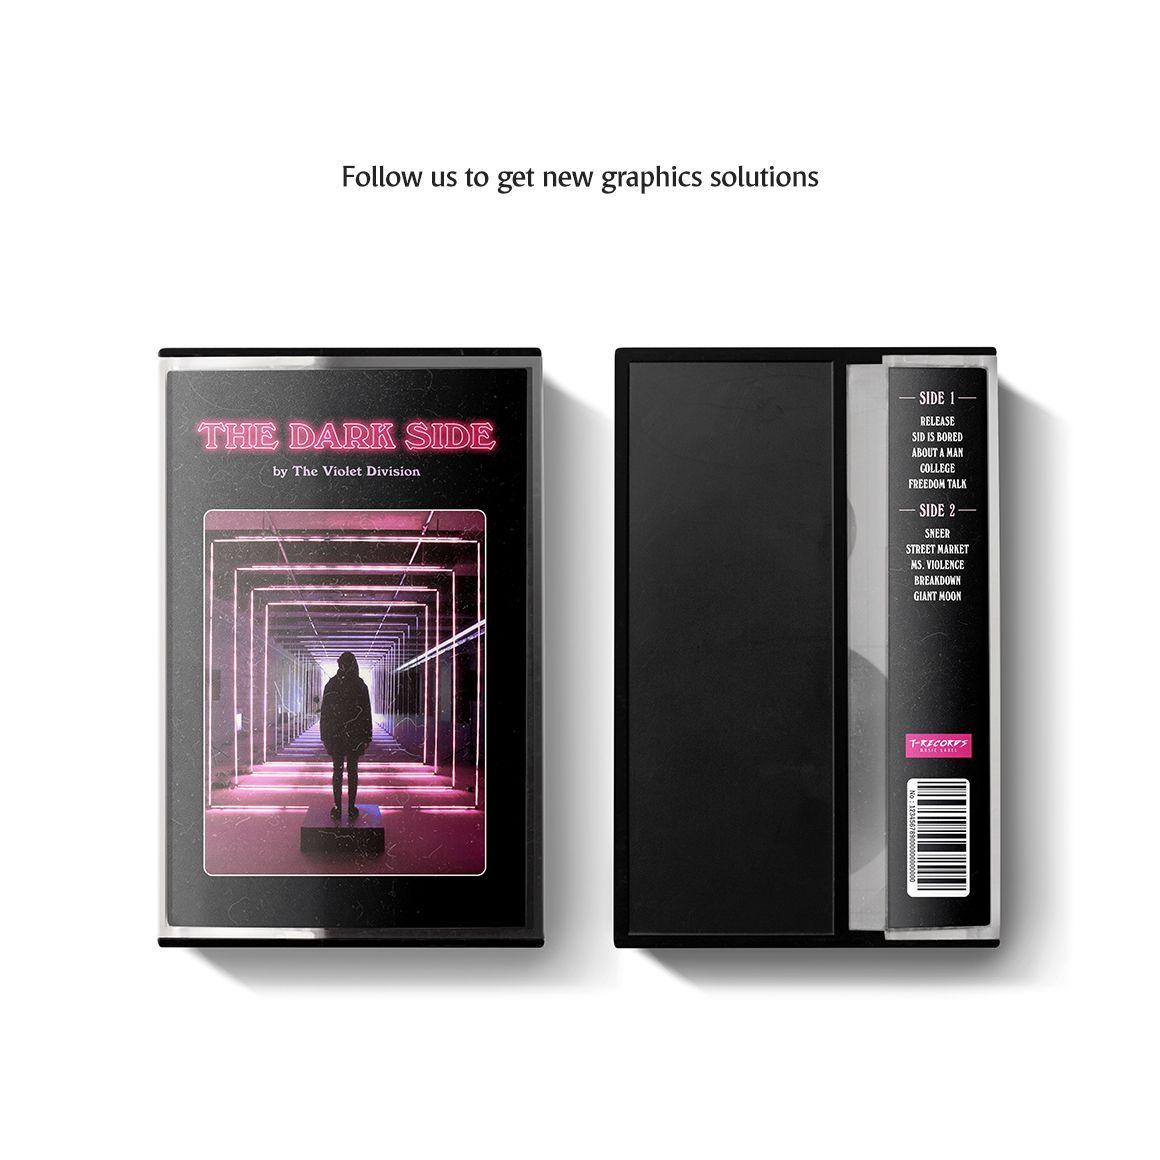 Cassette Tape Mockup Product Mockup 78386 Product Mockups Ideas Of Product Mockups Productmockups Cassette Tape In 2020 Cassette Tapes Cassette Cassette Case